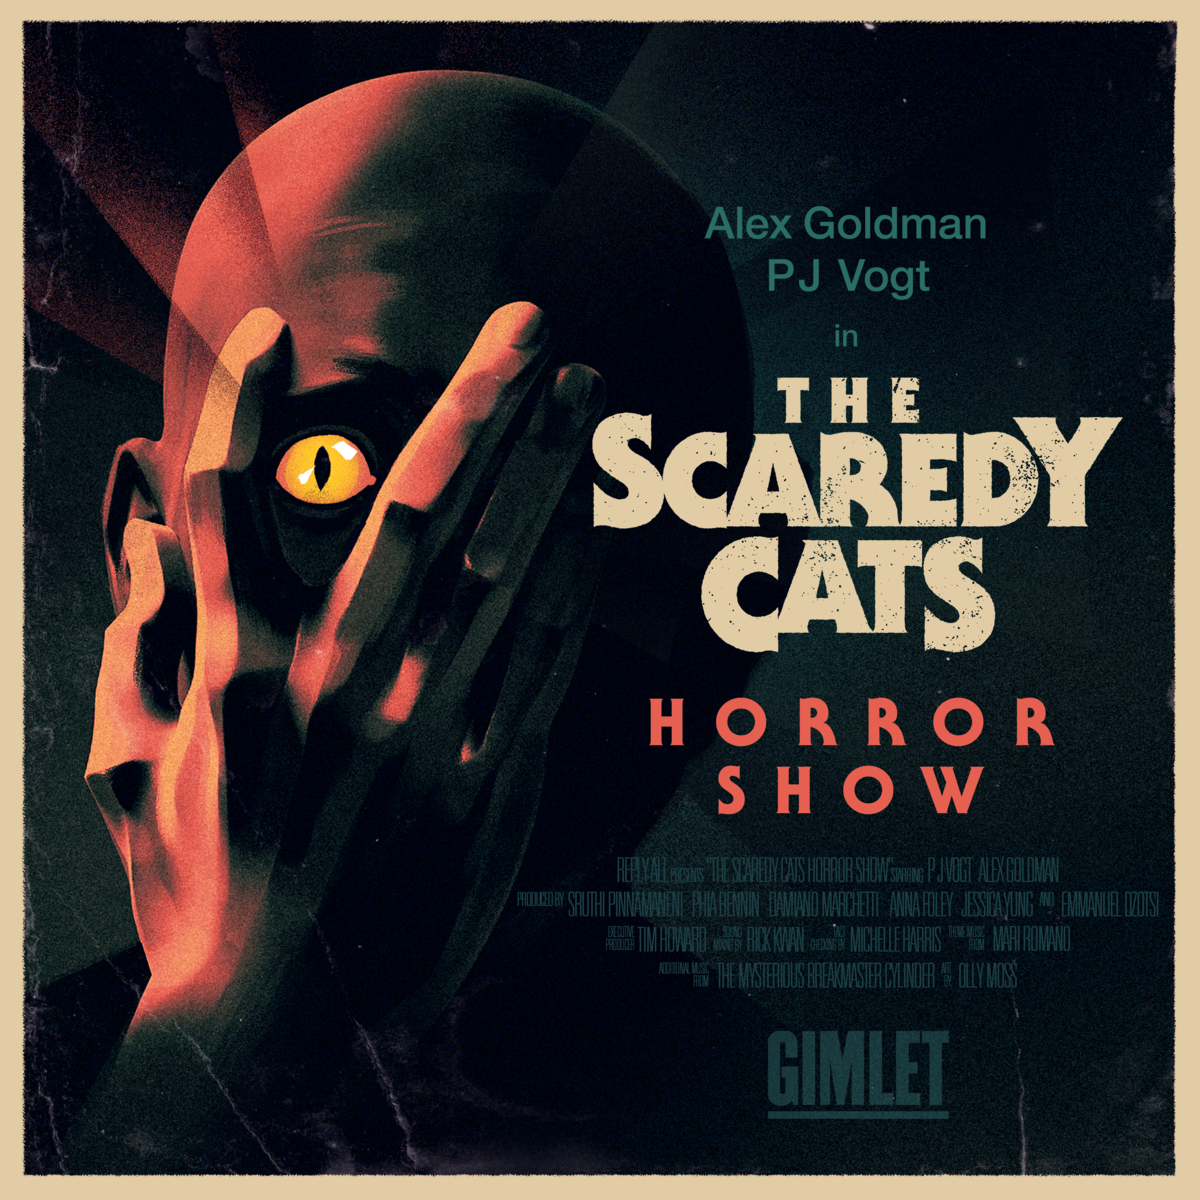 Show artwork for The Scaredy Cats Horror Show